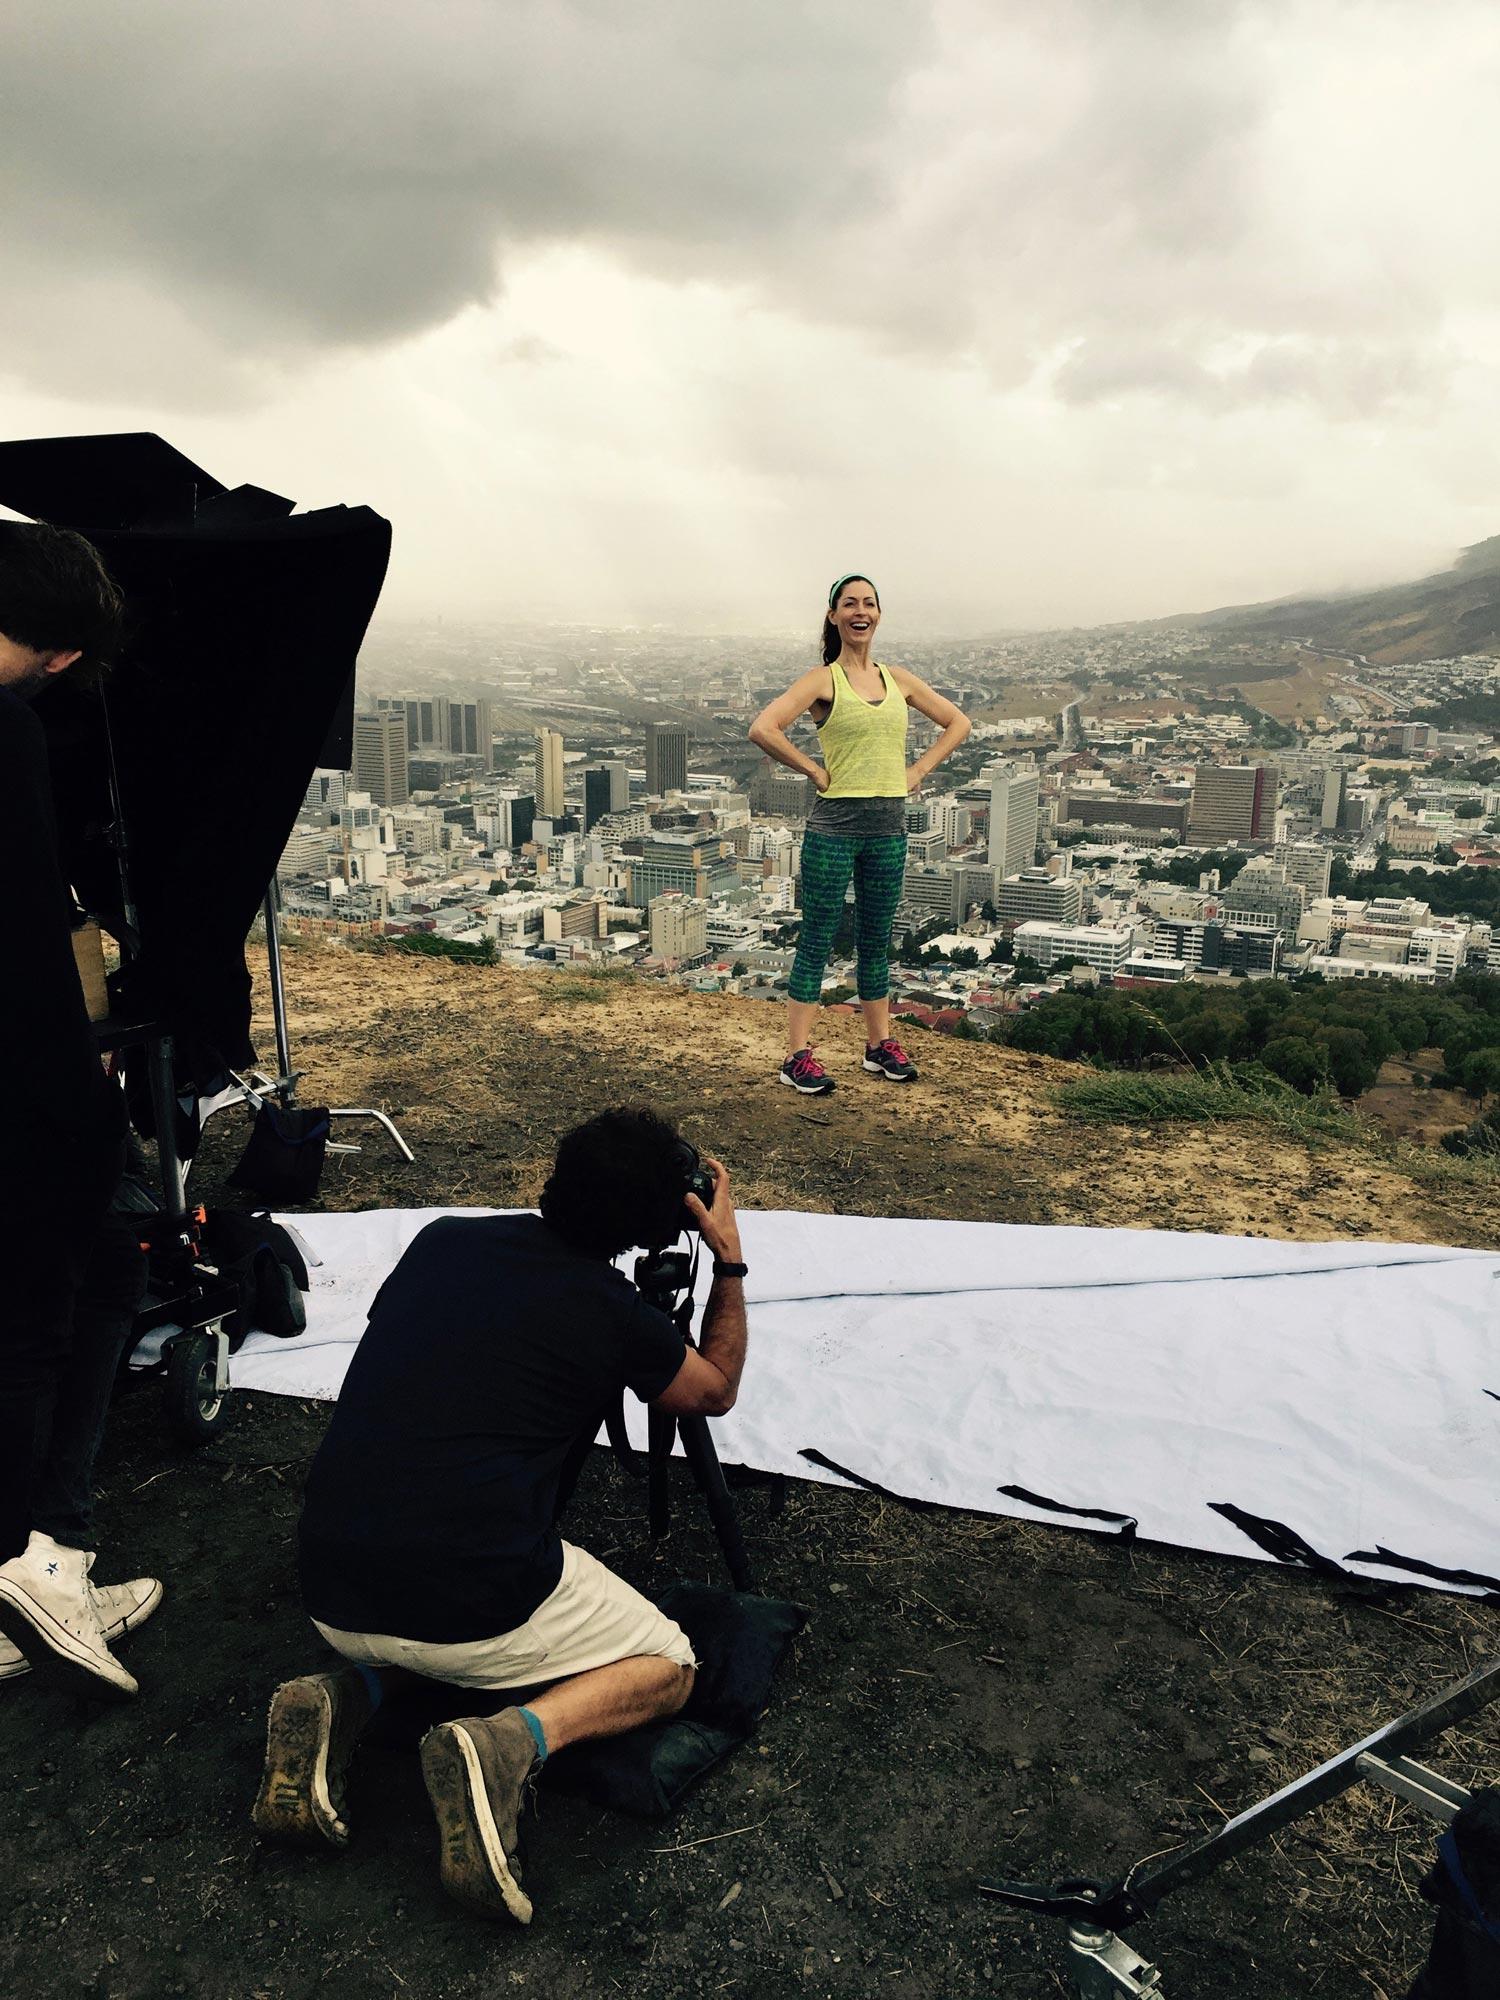 Cape-Town-ShootIMG_8113.jpg